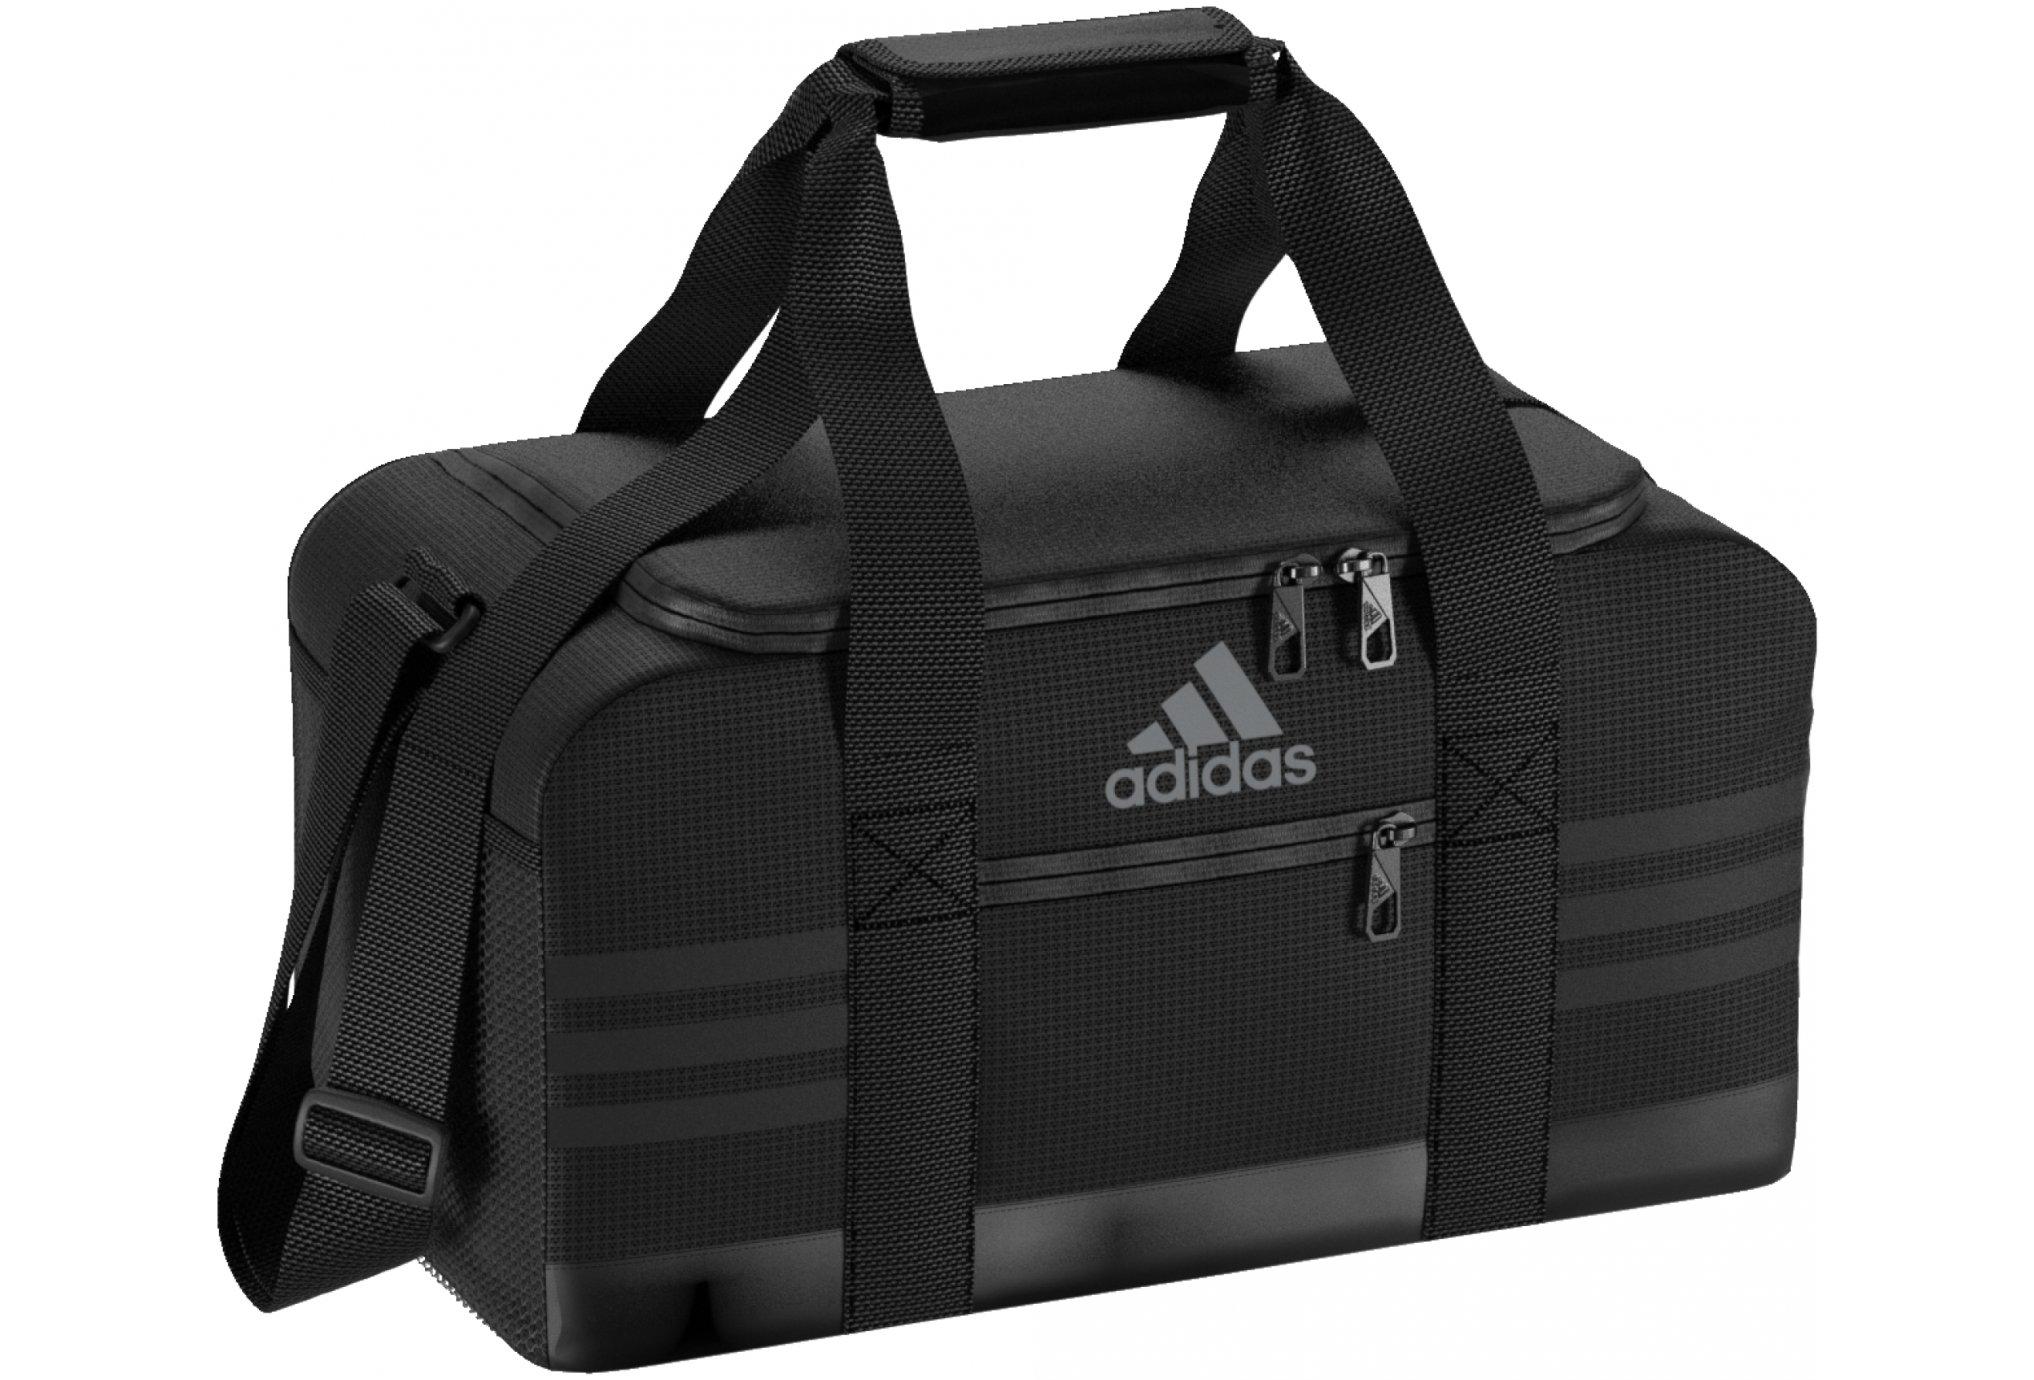 adidas Sac de sport Performance 3S - XS Sac de sport